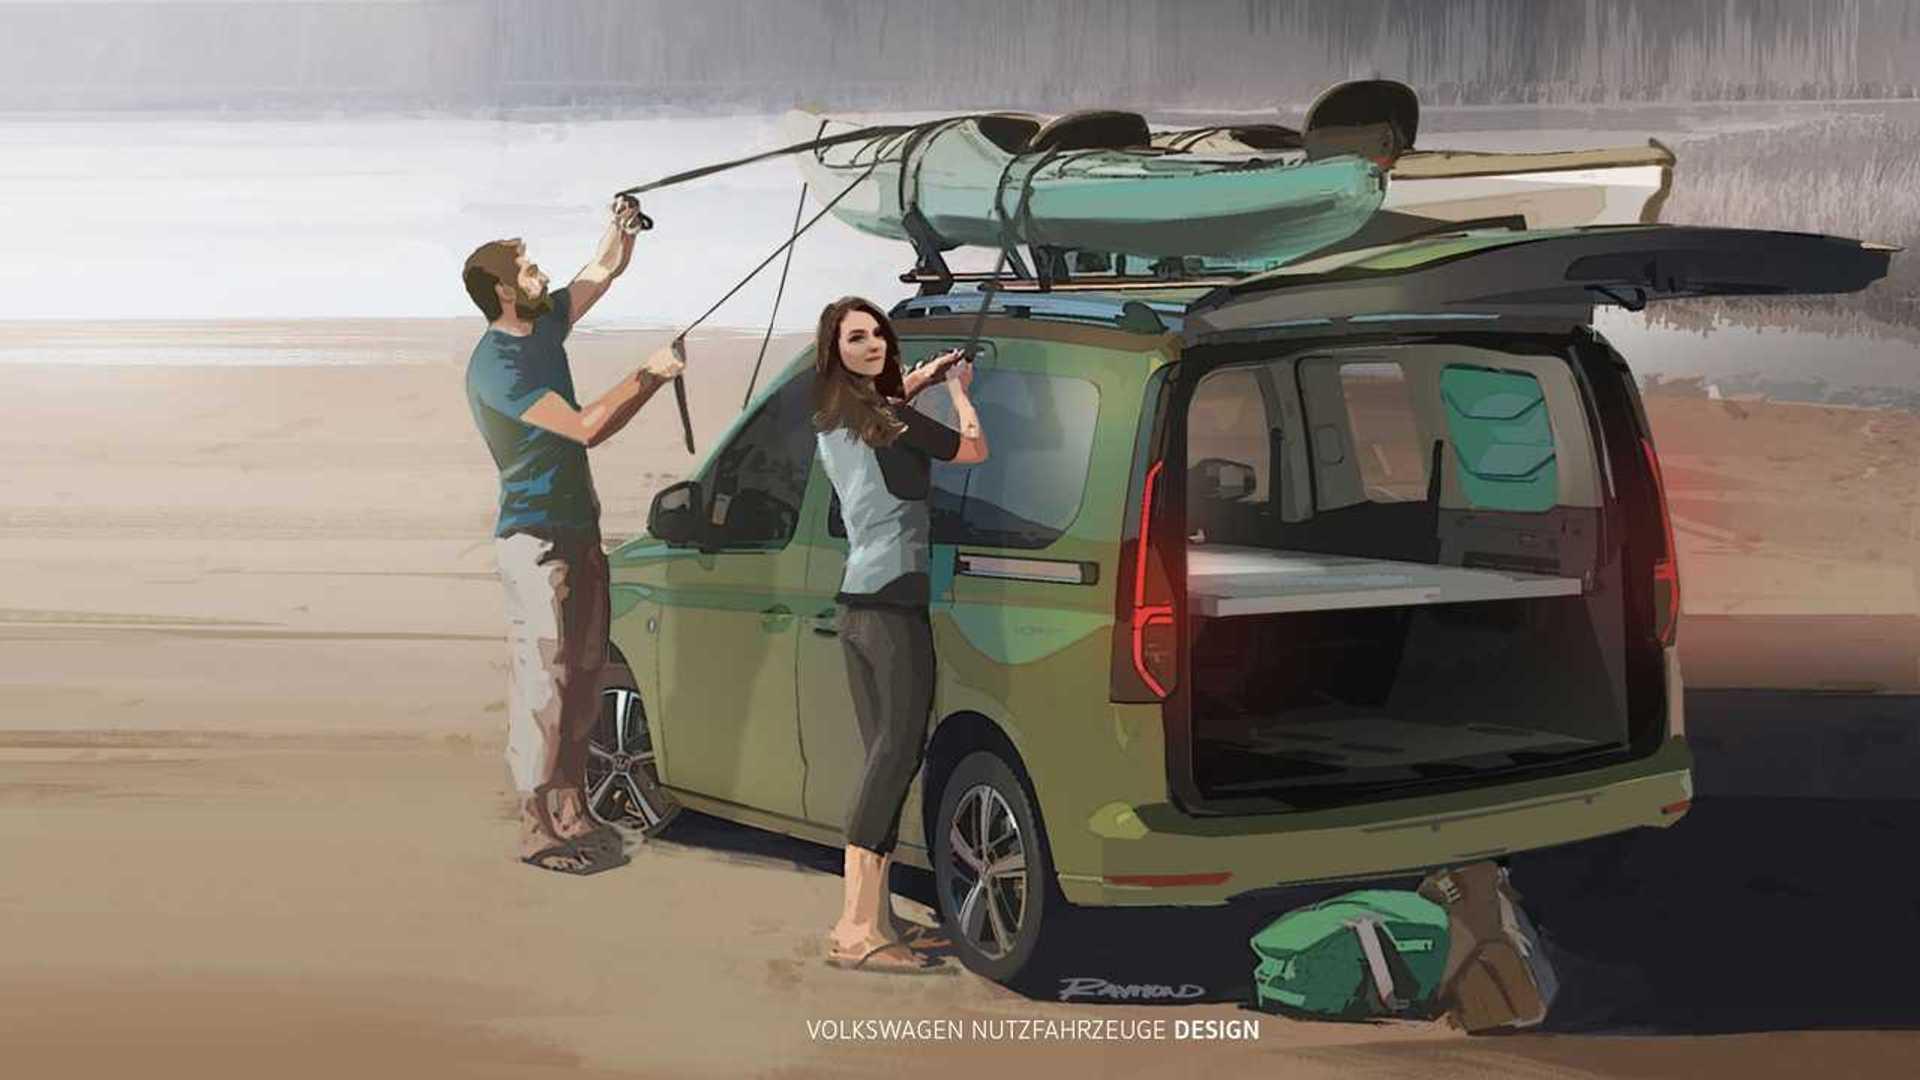 VW Caddy Mini Camper Teased As Pint-Sized RV Debuting In September